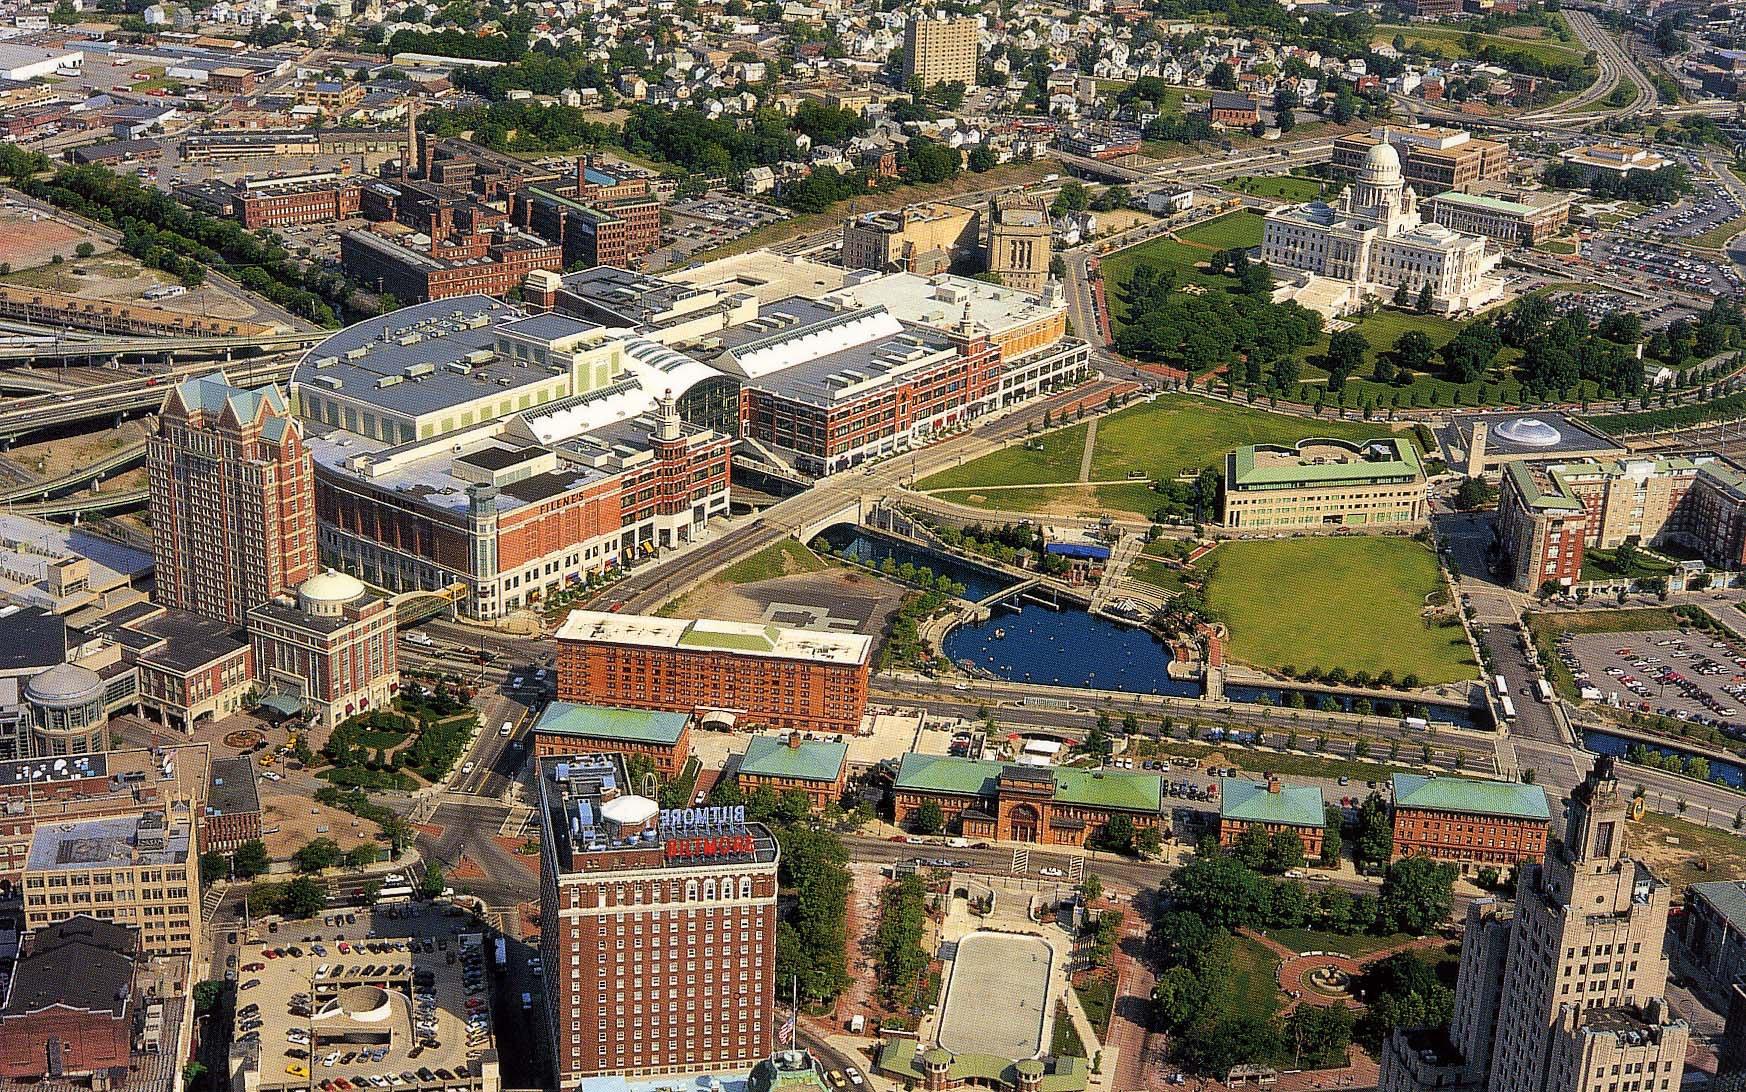 Capital Center Providence aerial